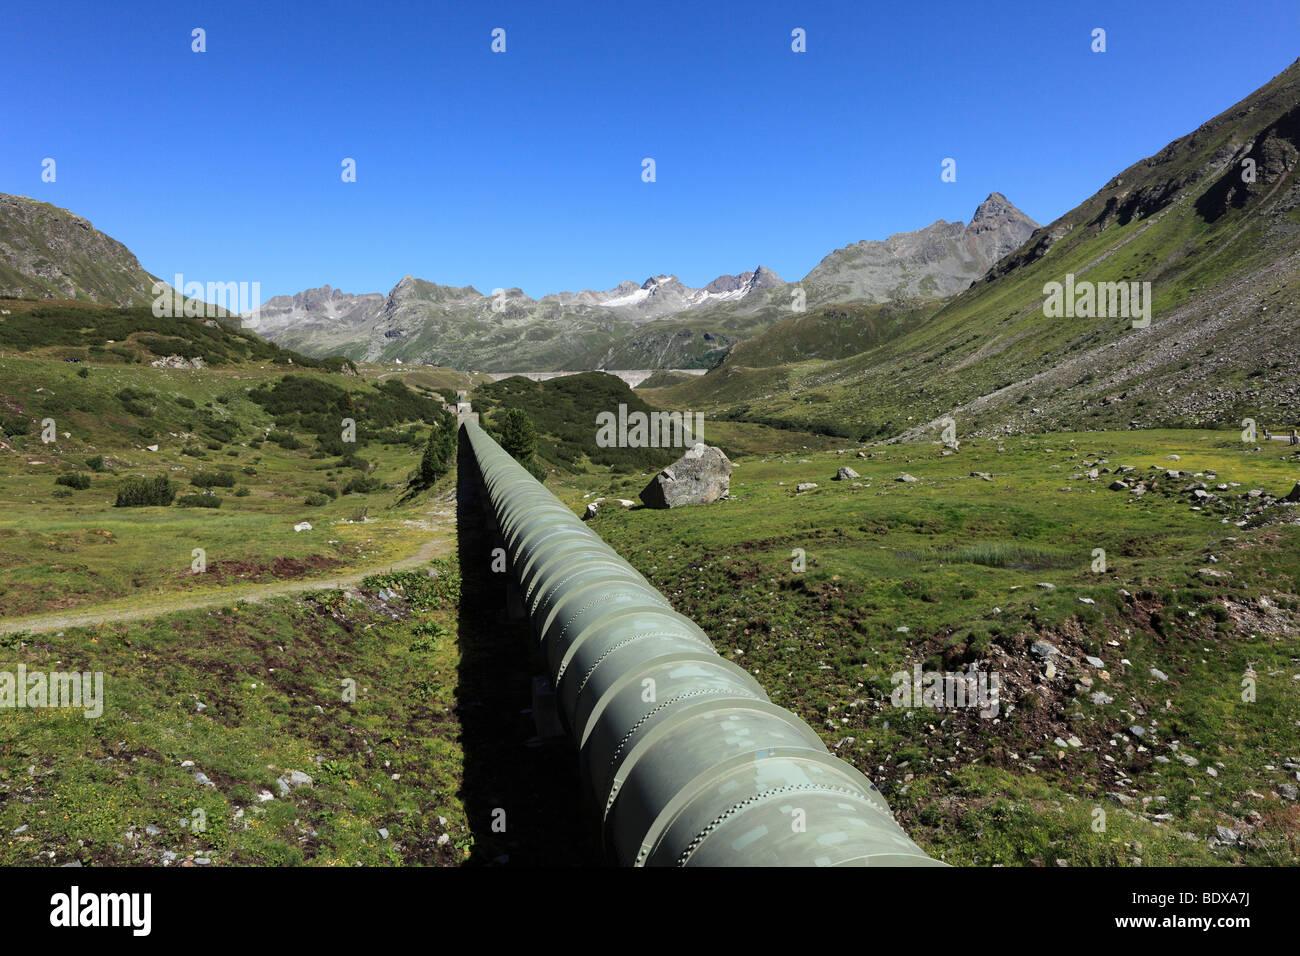 Dam and water pipeline from Lake Silvretta, Bielerhoehe, Grossvermunt, Montafon, Silvretta Group, Vorarlberg, Austria, - Stock Image